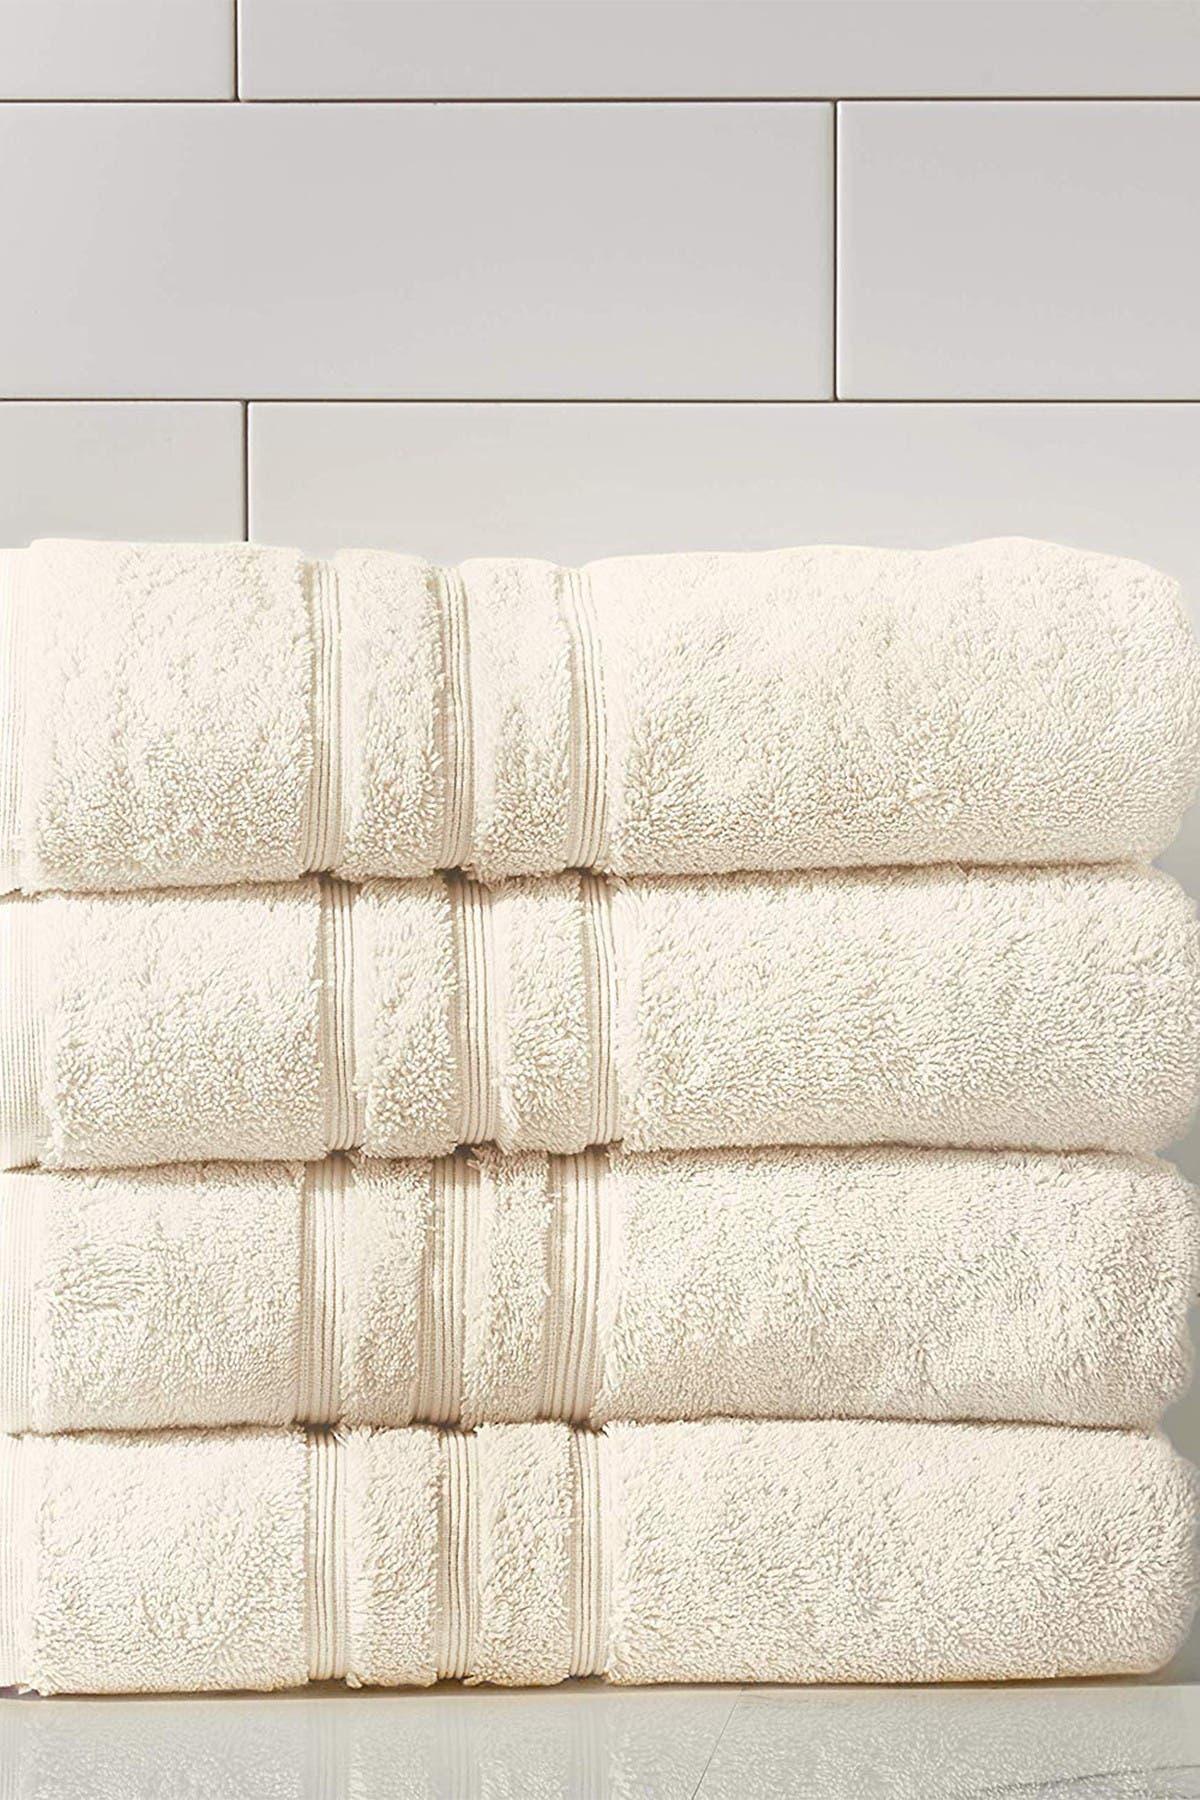 Image of Modern Threads Manor Ridge Turkish Cotton 700 GSM Bath Towel - Set of 4 - Ivory